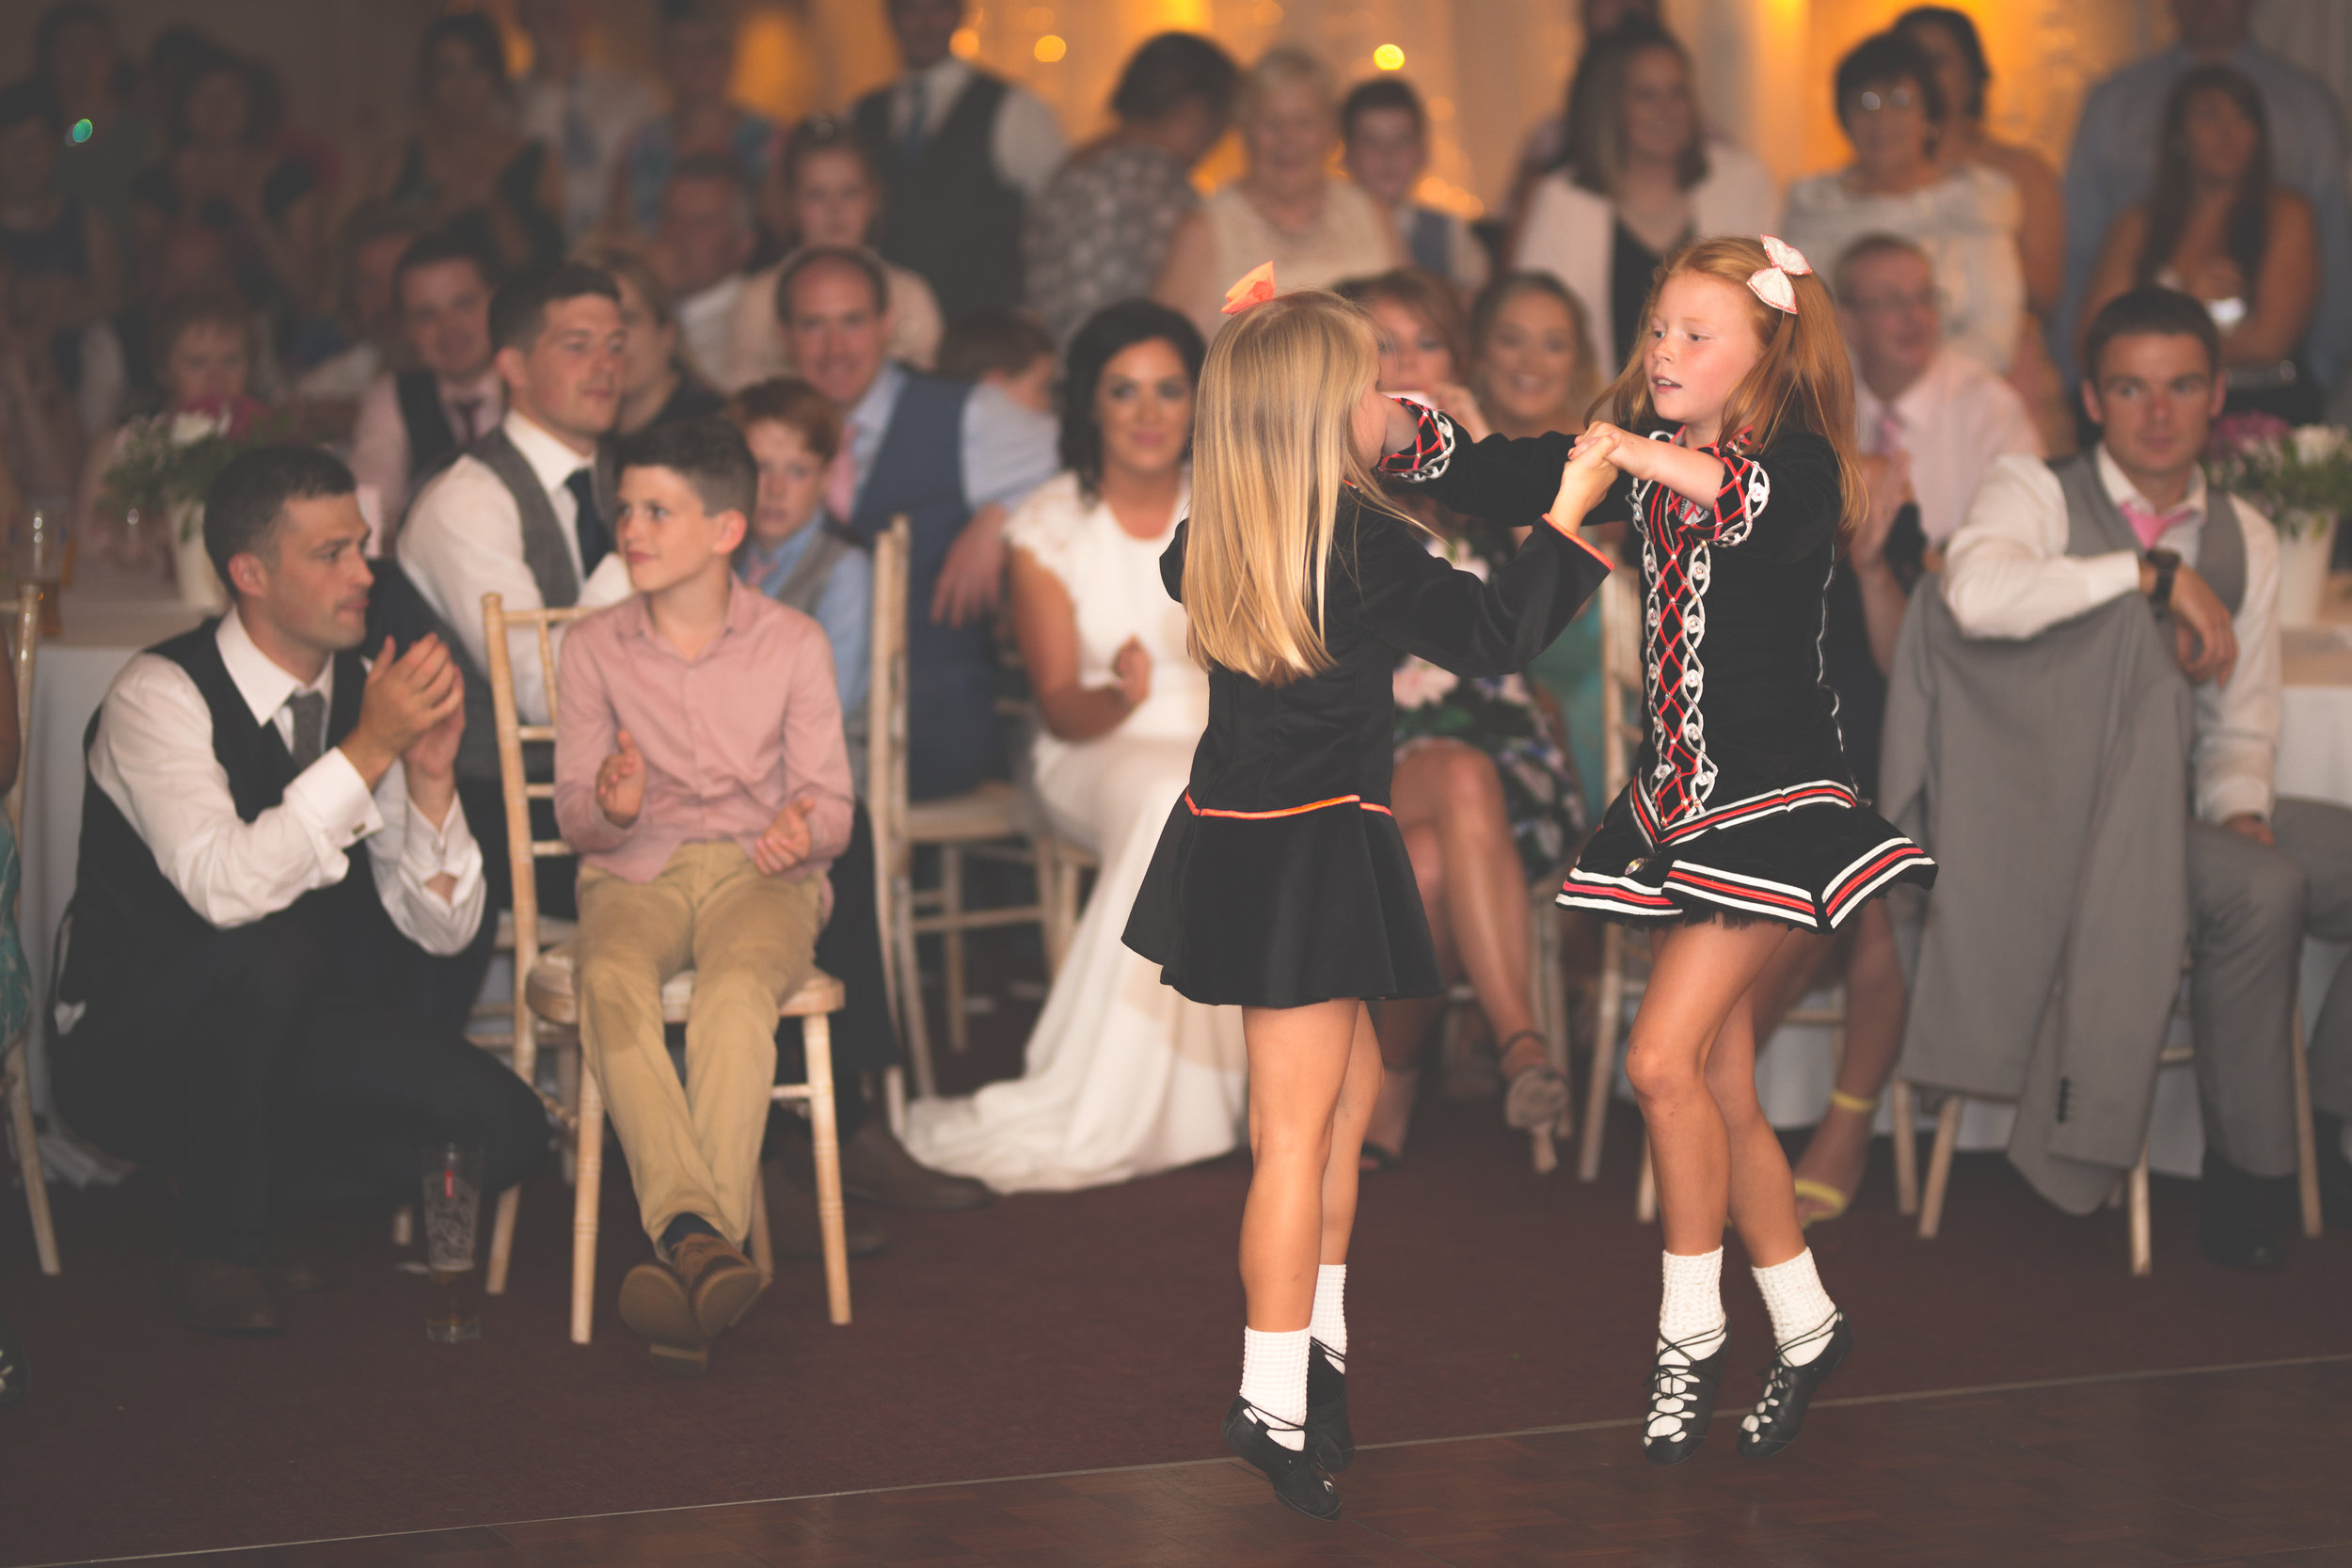 Brian McEwan Wedding Photography | Carol-Annee & Sean | The Dancing-13.jpg